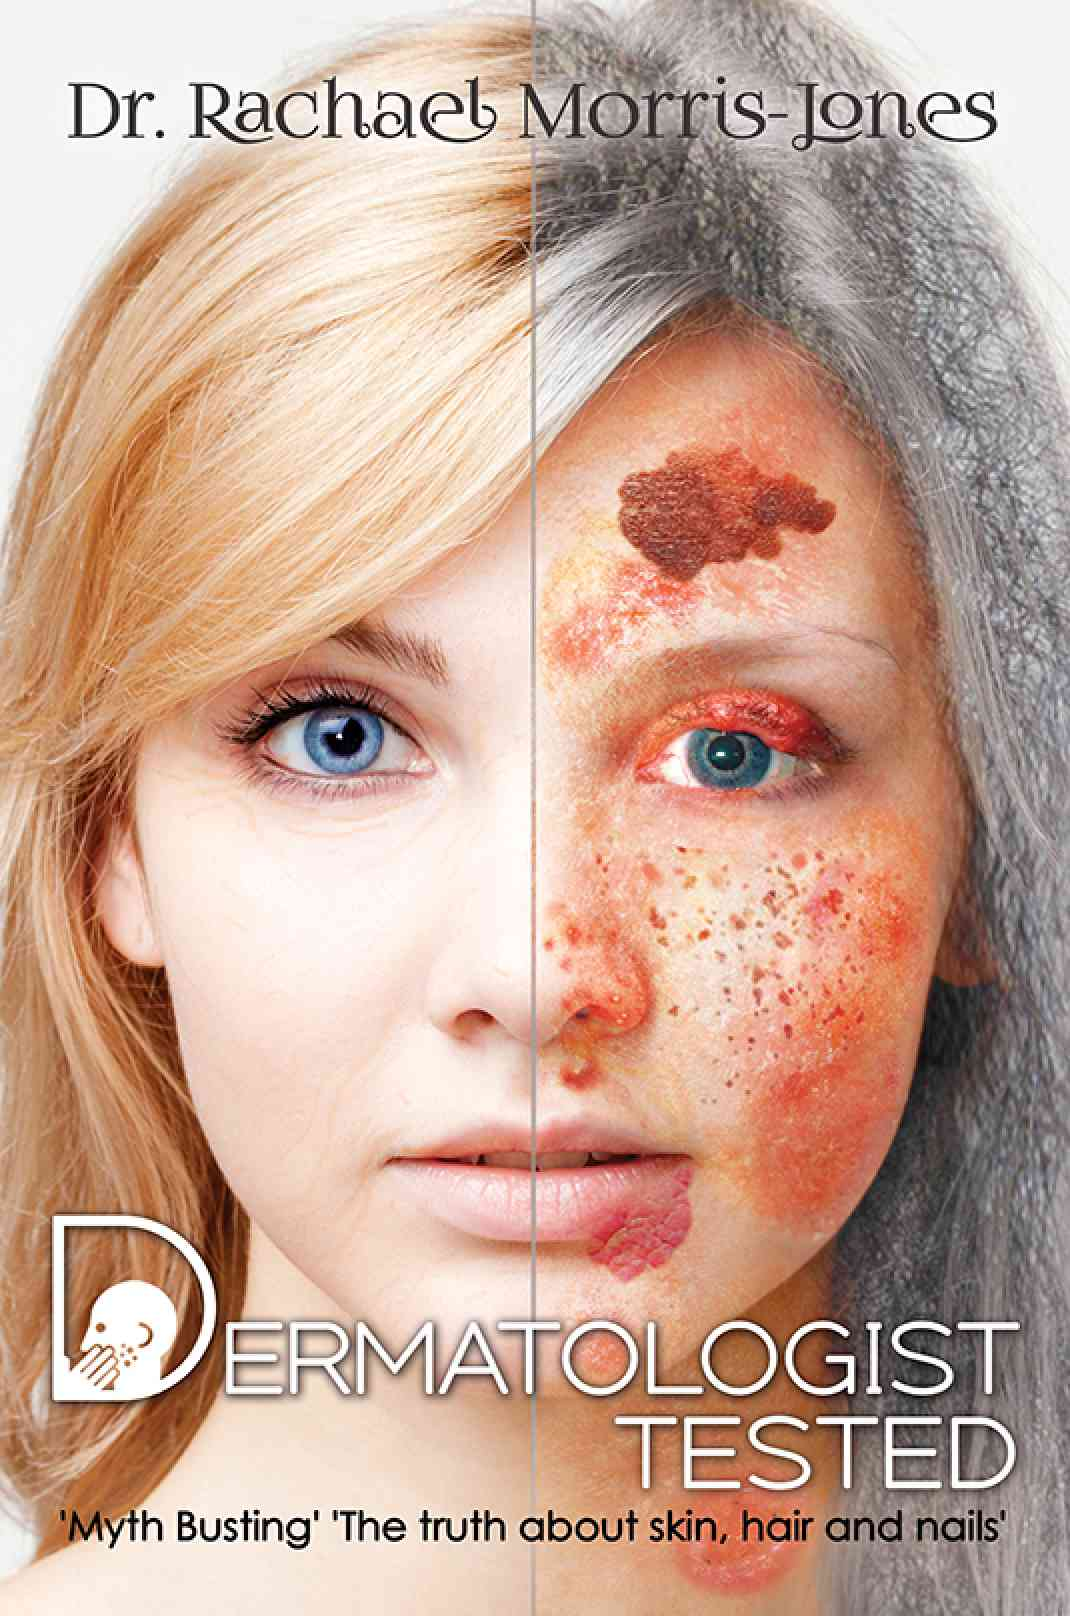 Dermatologist Tested Book Austin Macauley Publishers